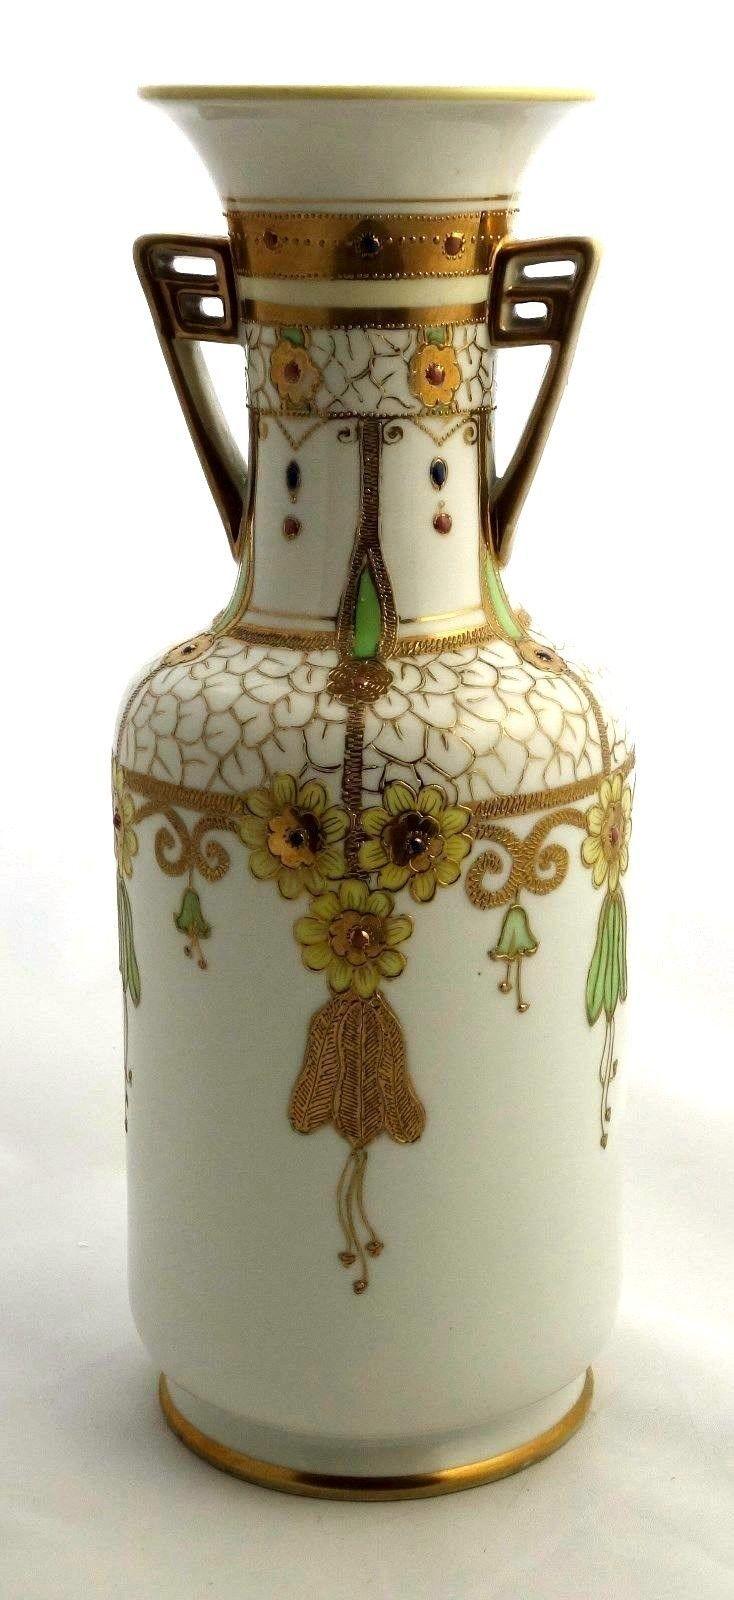 122 best noritake images on pinterest noritake porcelain and noritake morimura nippon art deco gold hand painted moriage 11 handled vase reviewsmspy